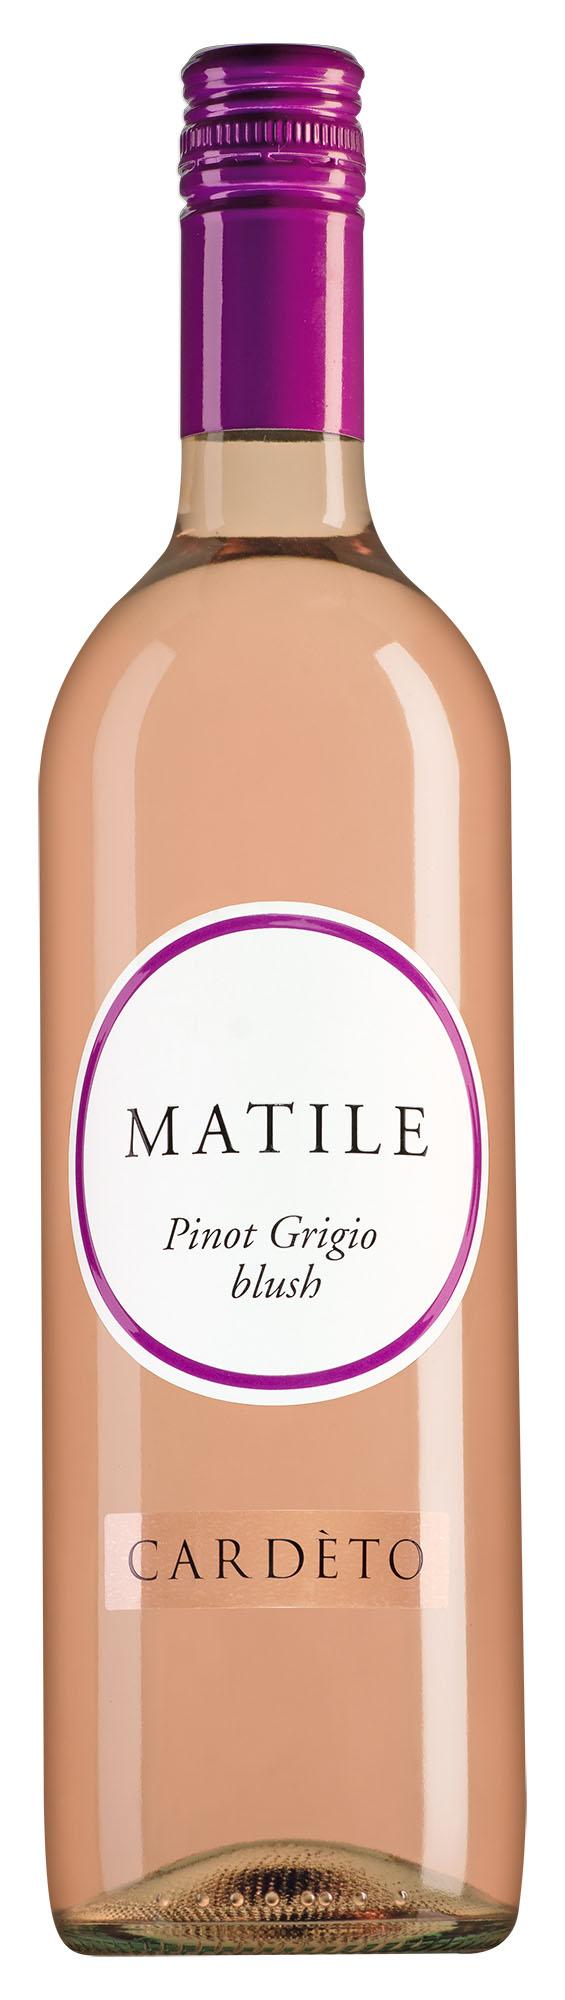 Cantina Cardèto Umbria Matile Pinot Grigio Blush